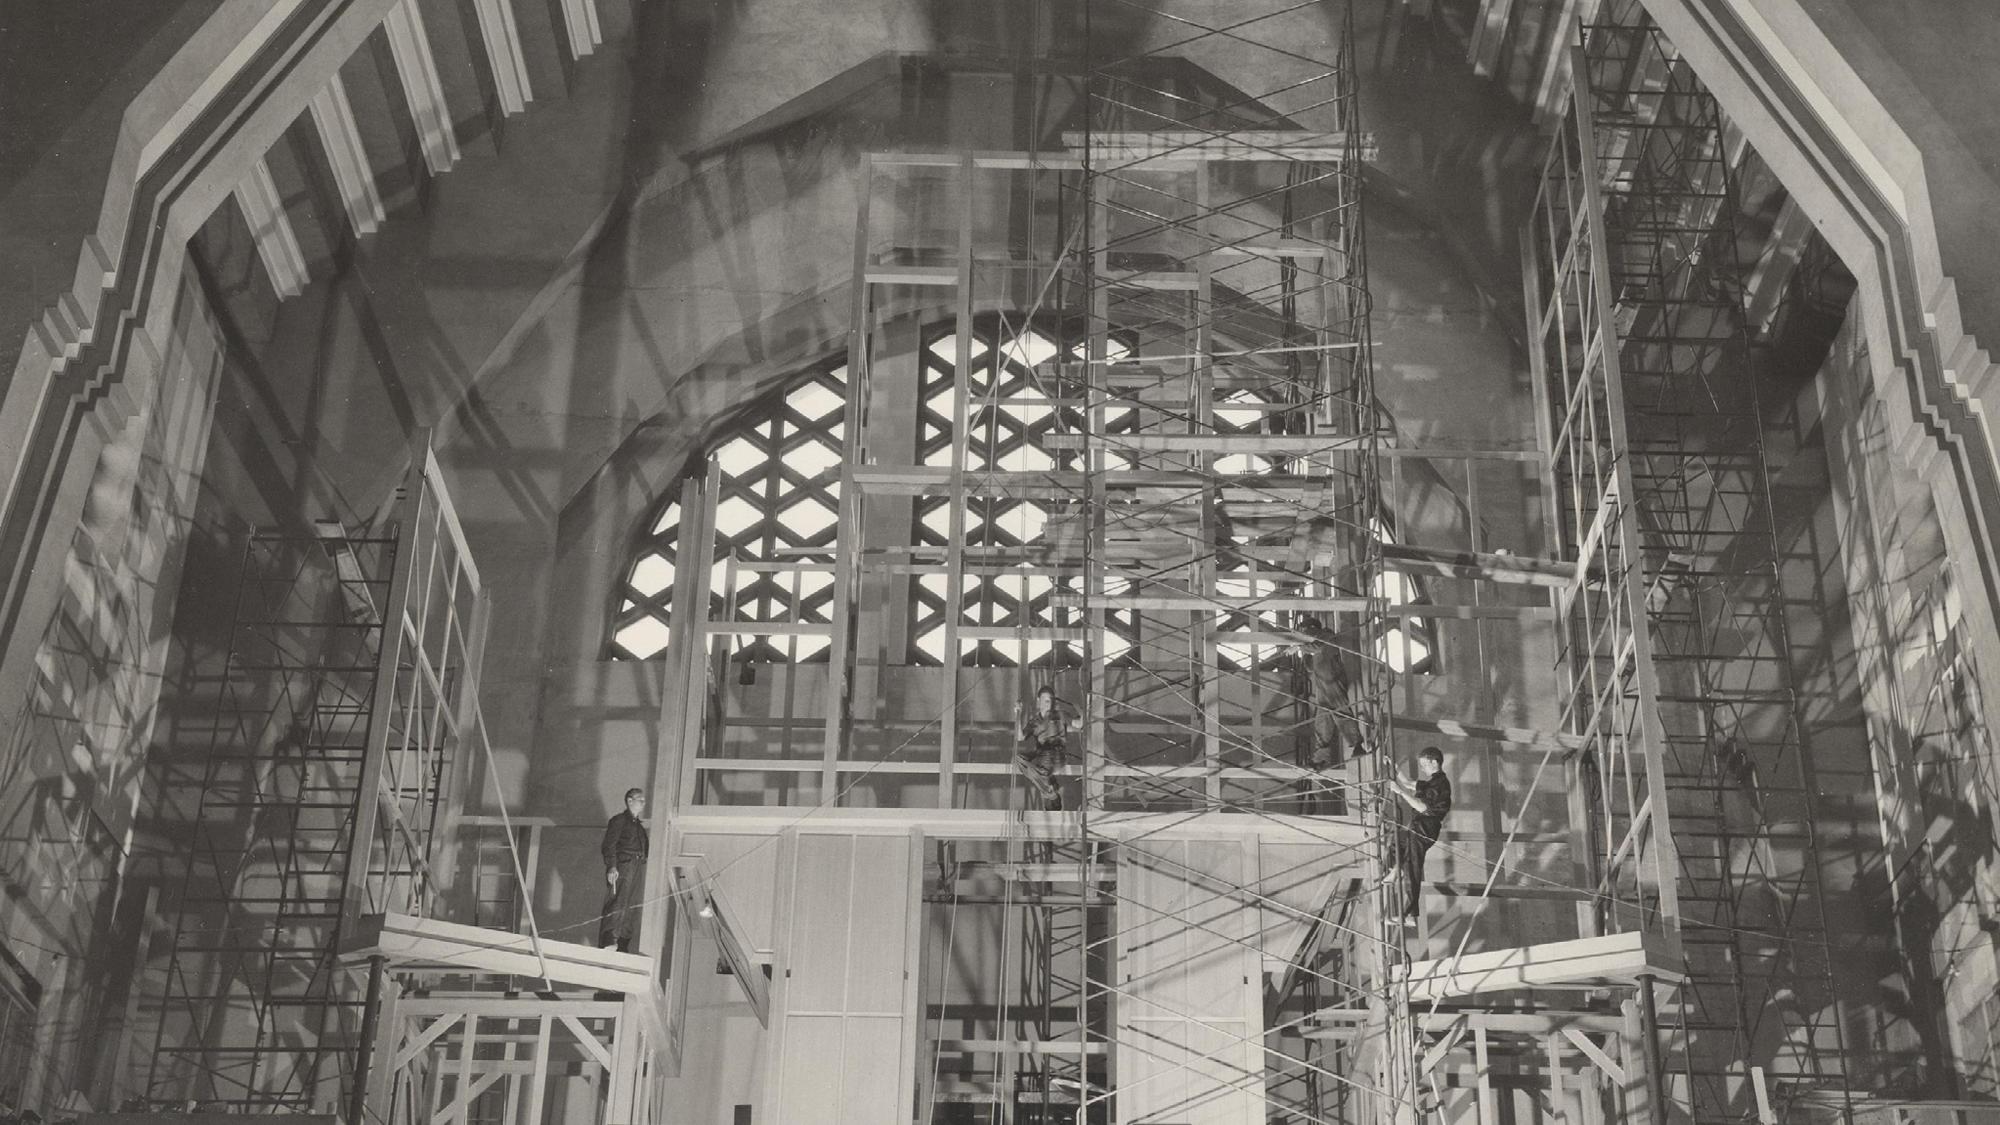 La petite histoire du grand orgue Beckerath de la basilique de l'Oratoire